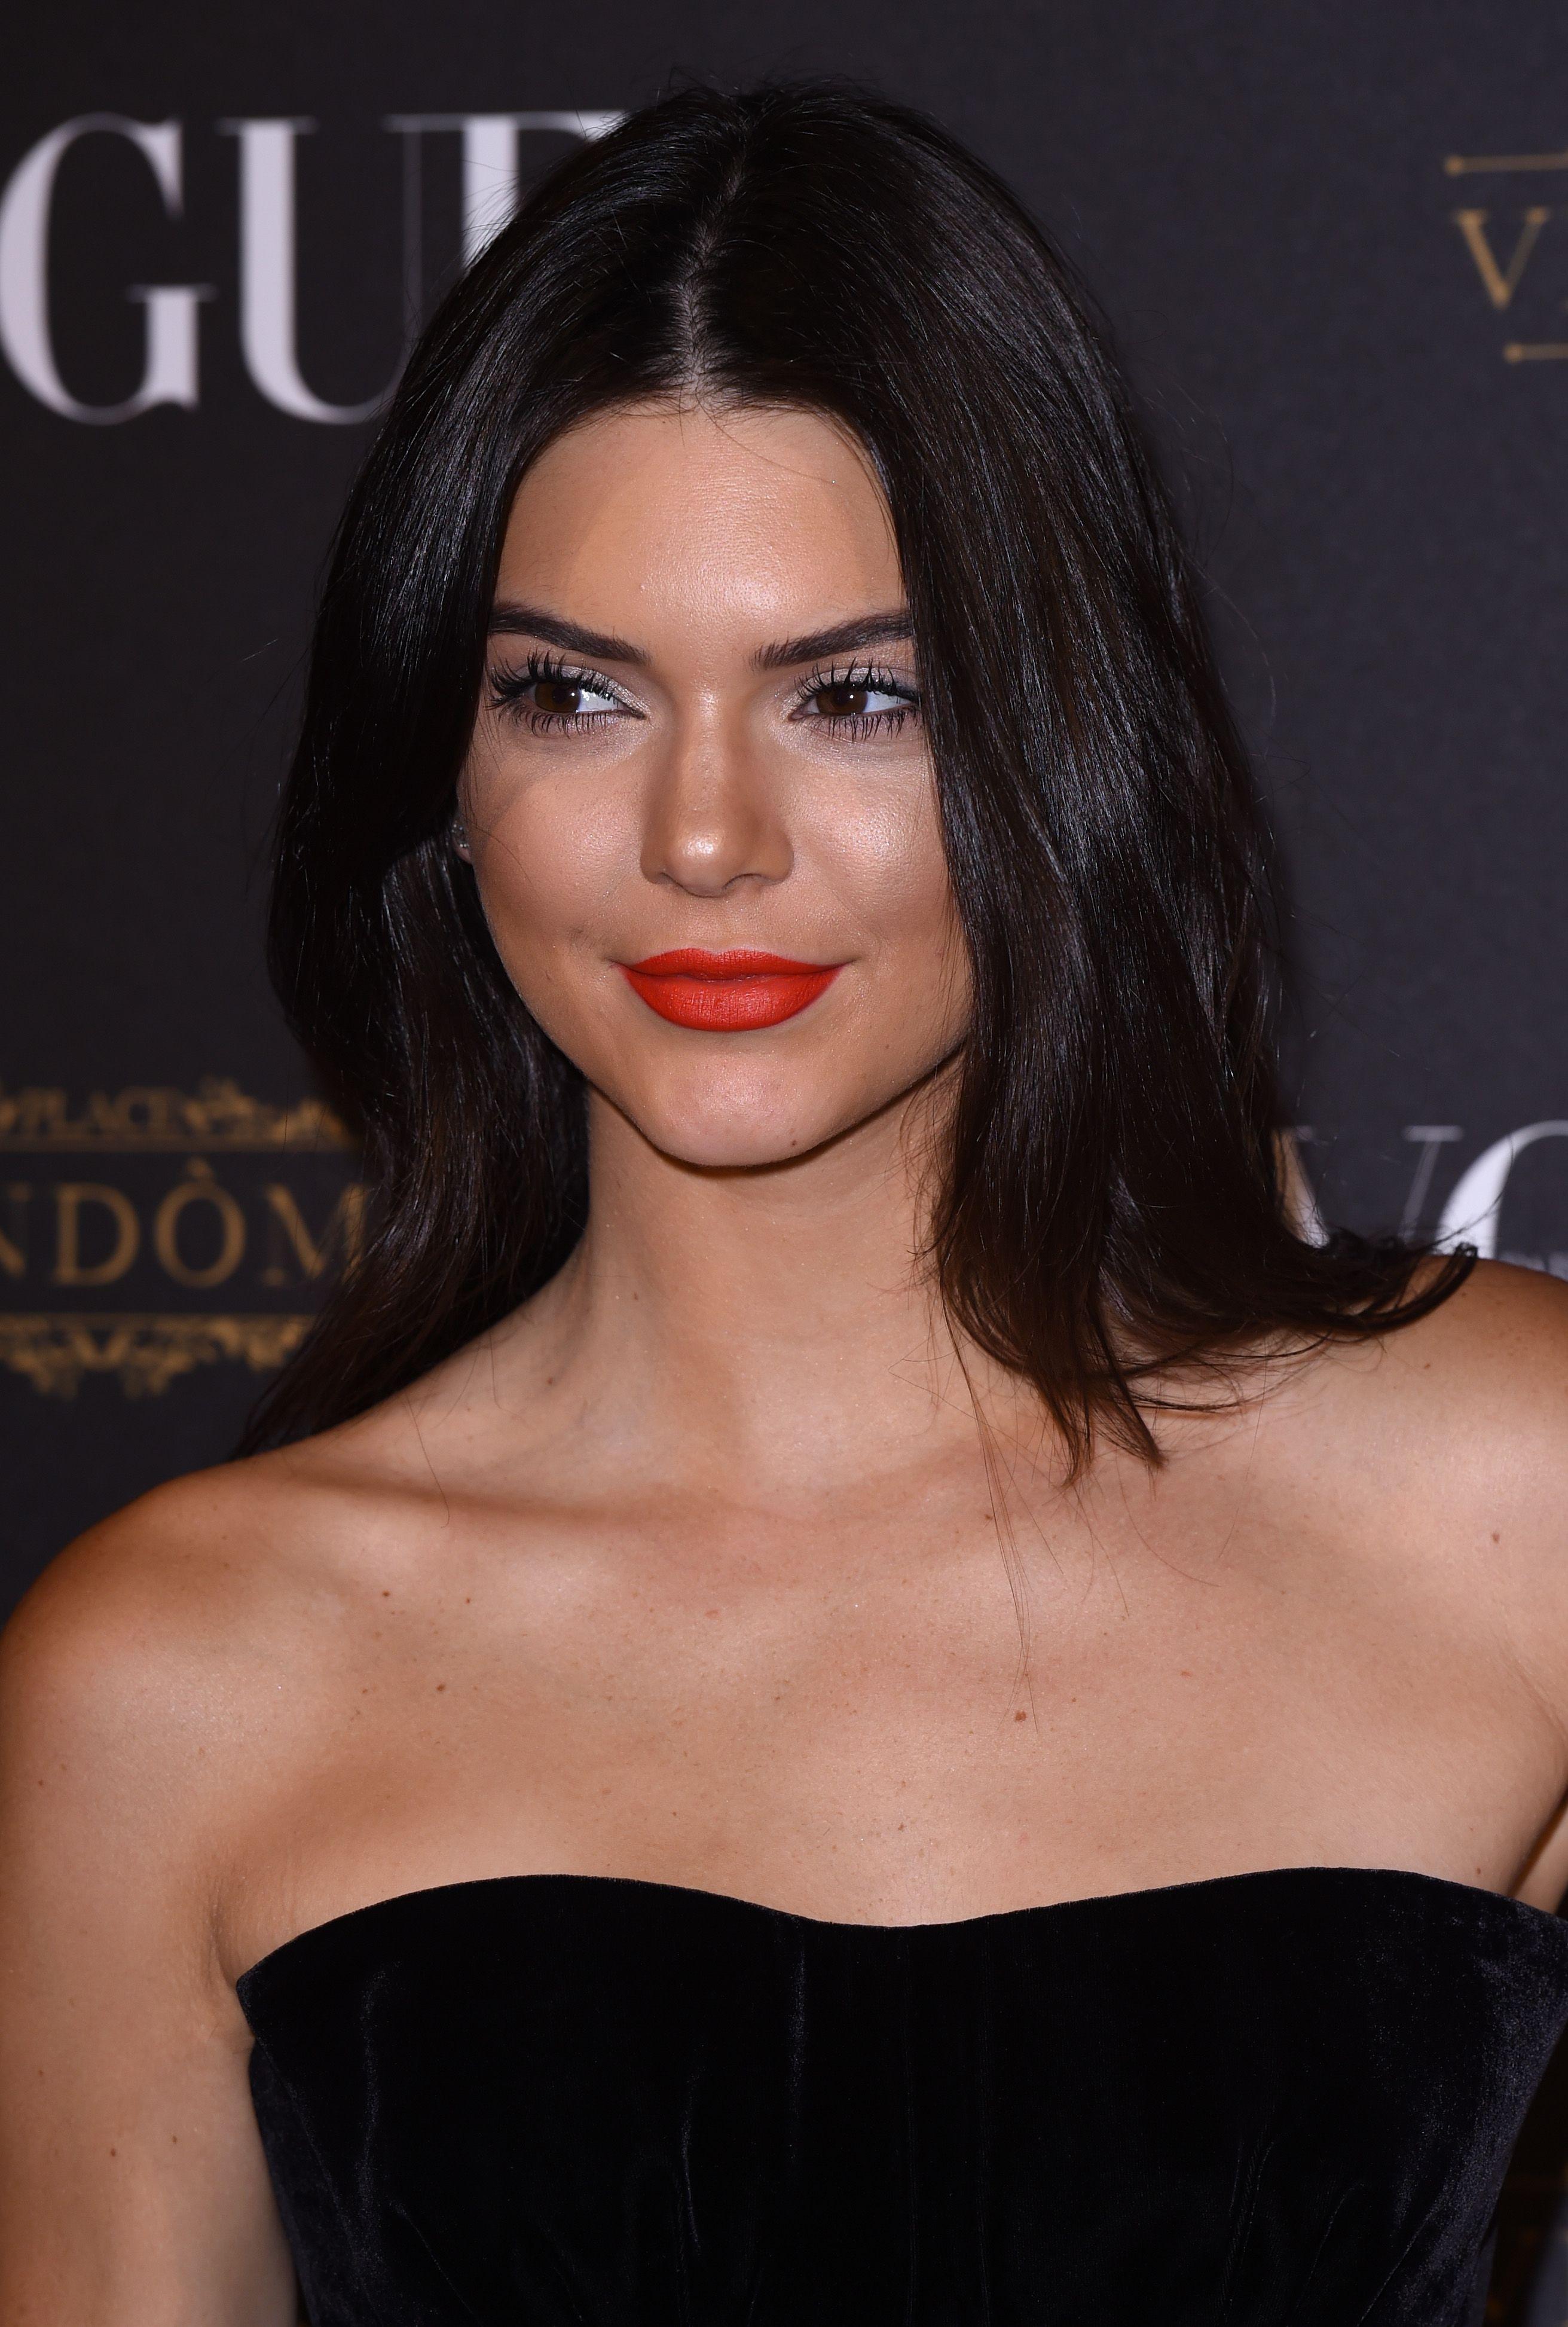 Kendall Jenner's 20th Birthday Party Draws Kimye, Gigi